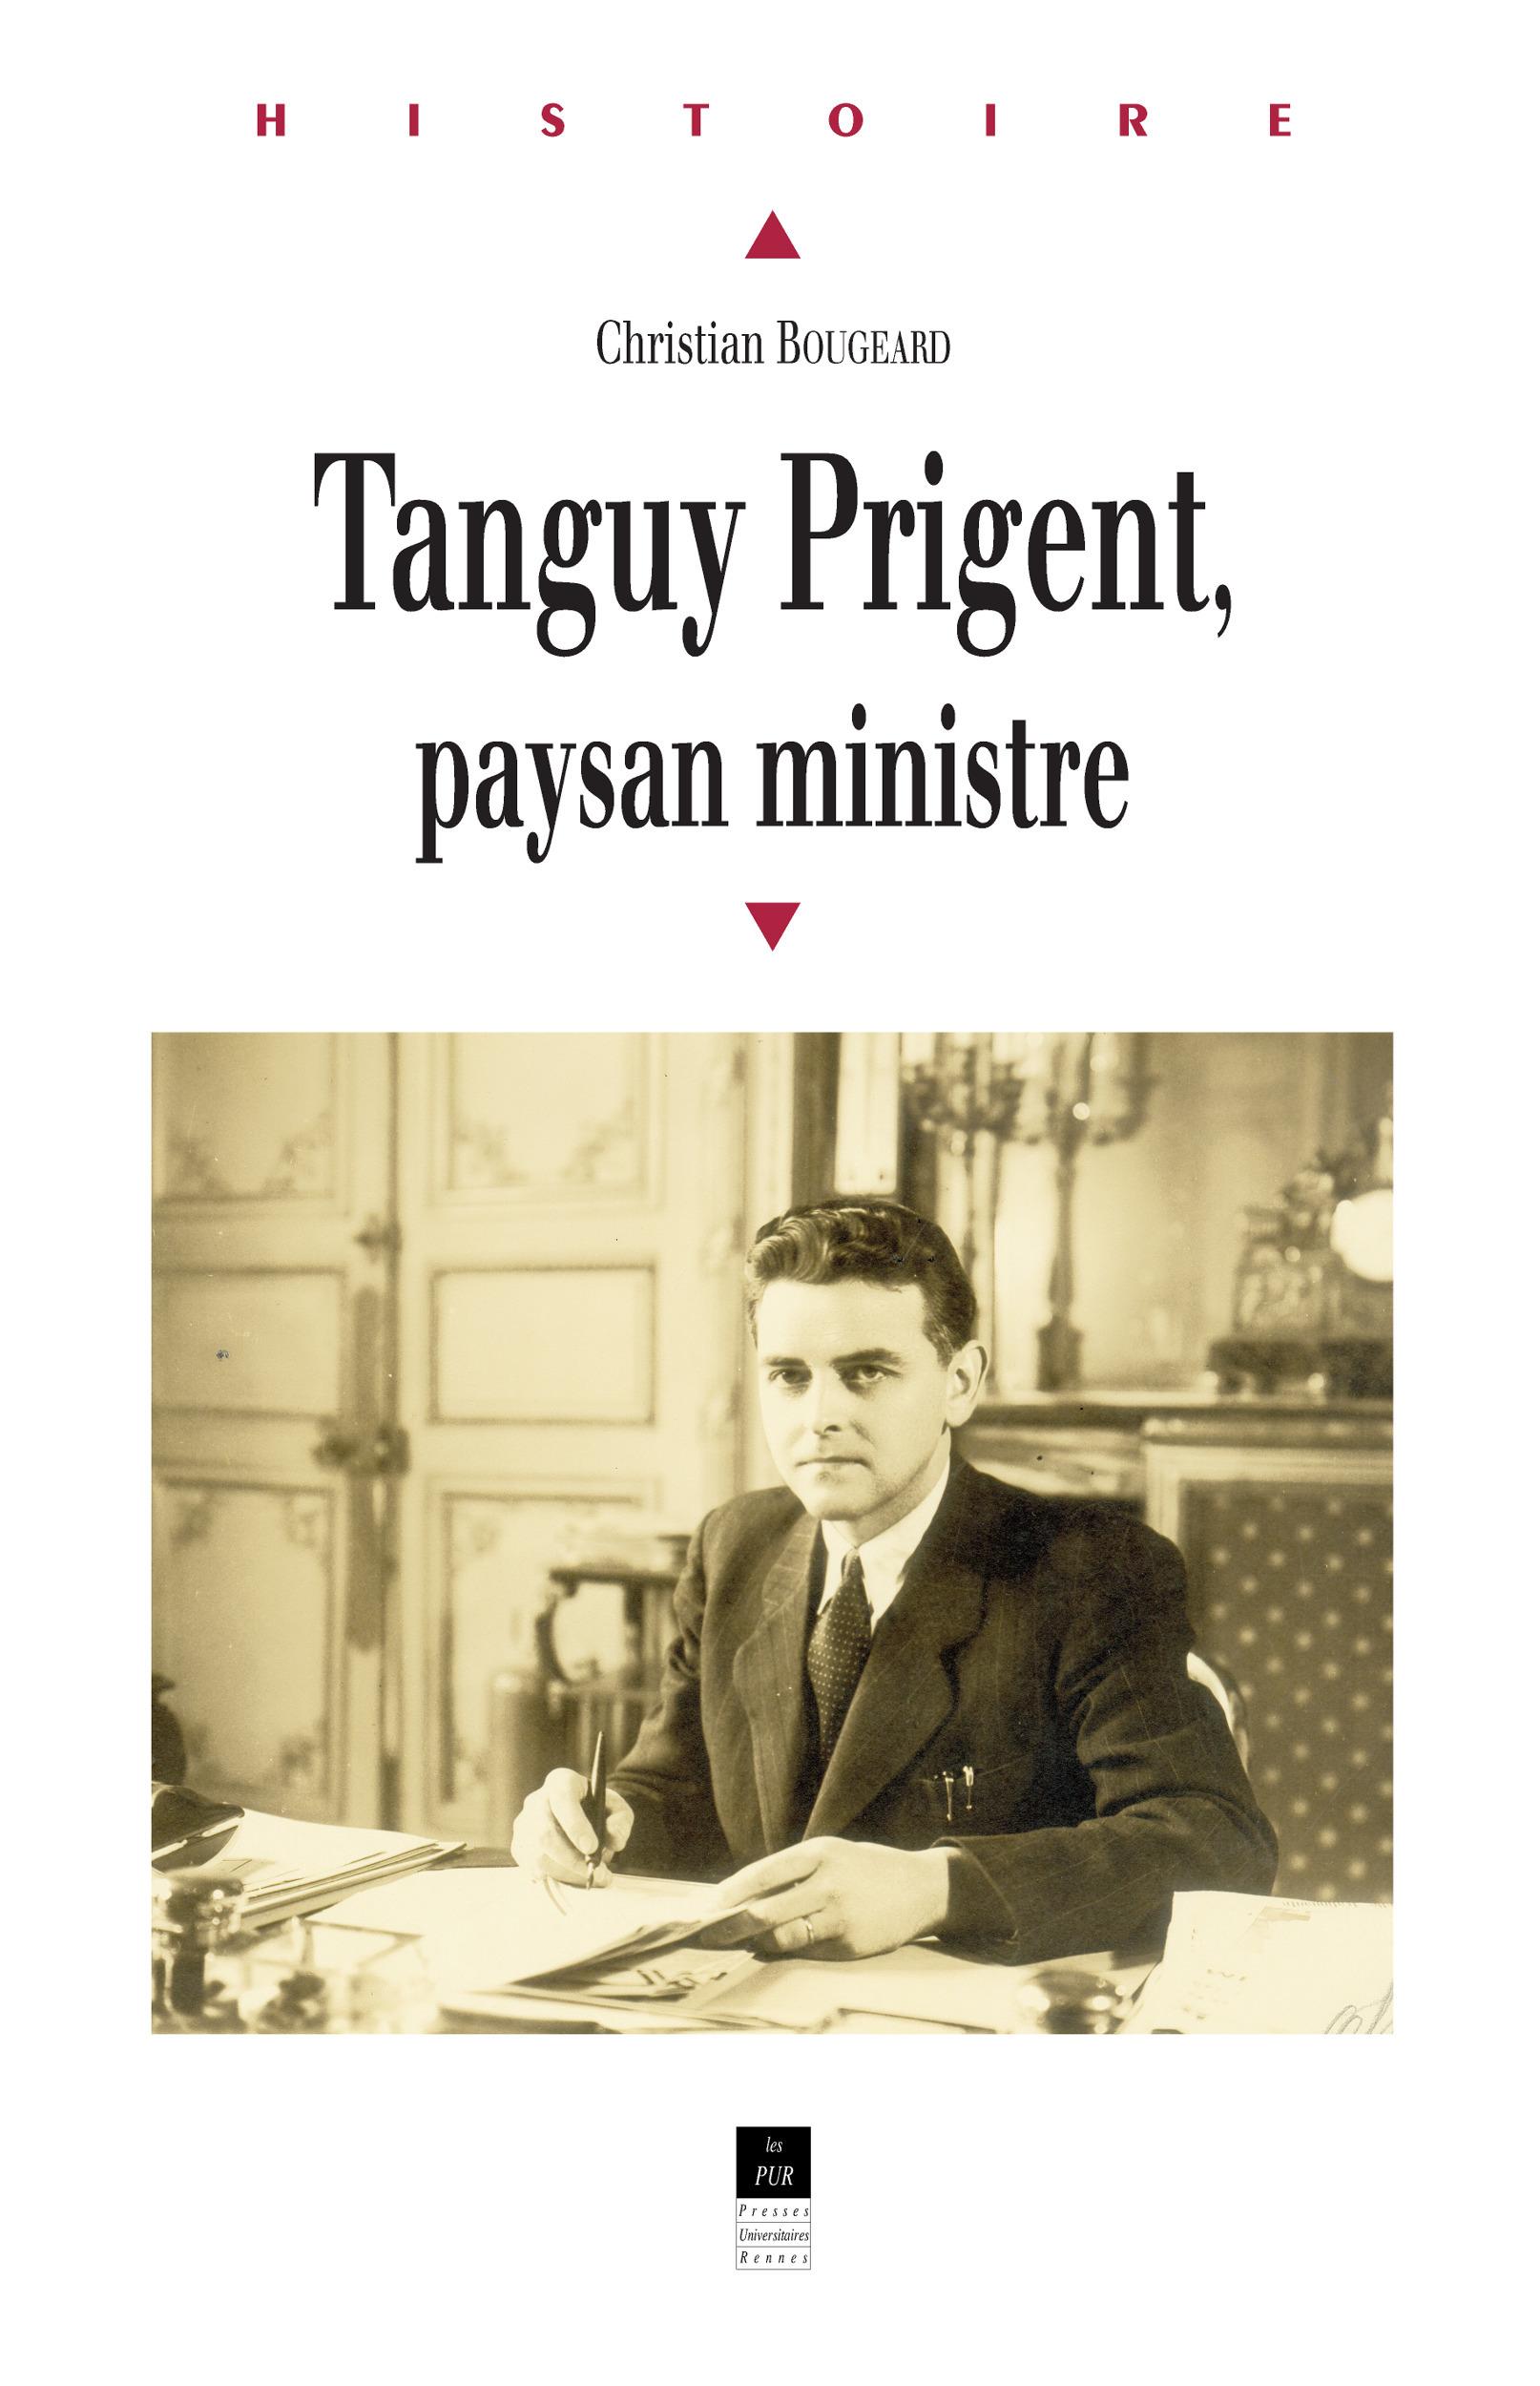 Tanguy Prigent, paysan ministre